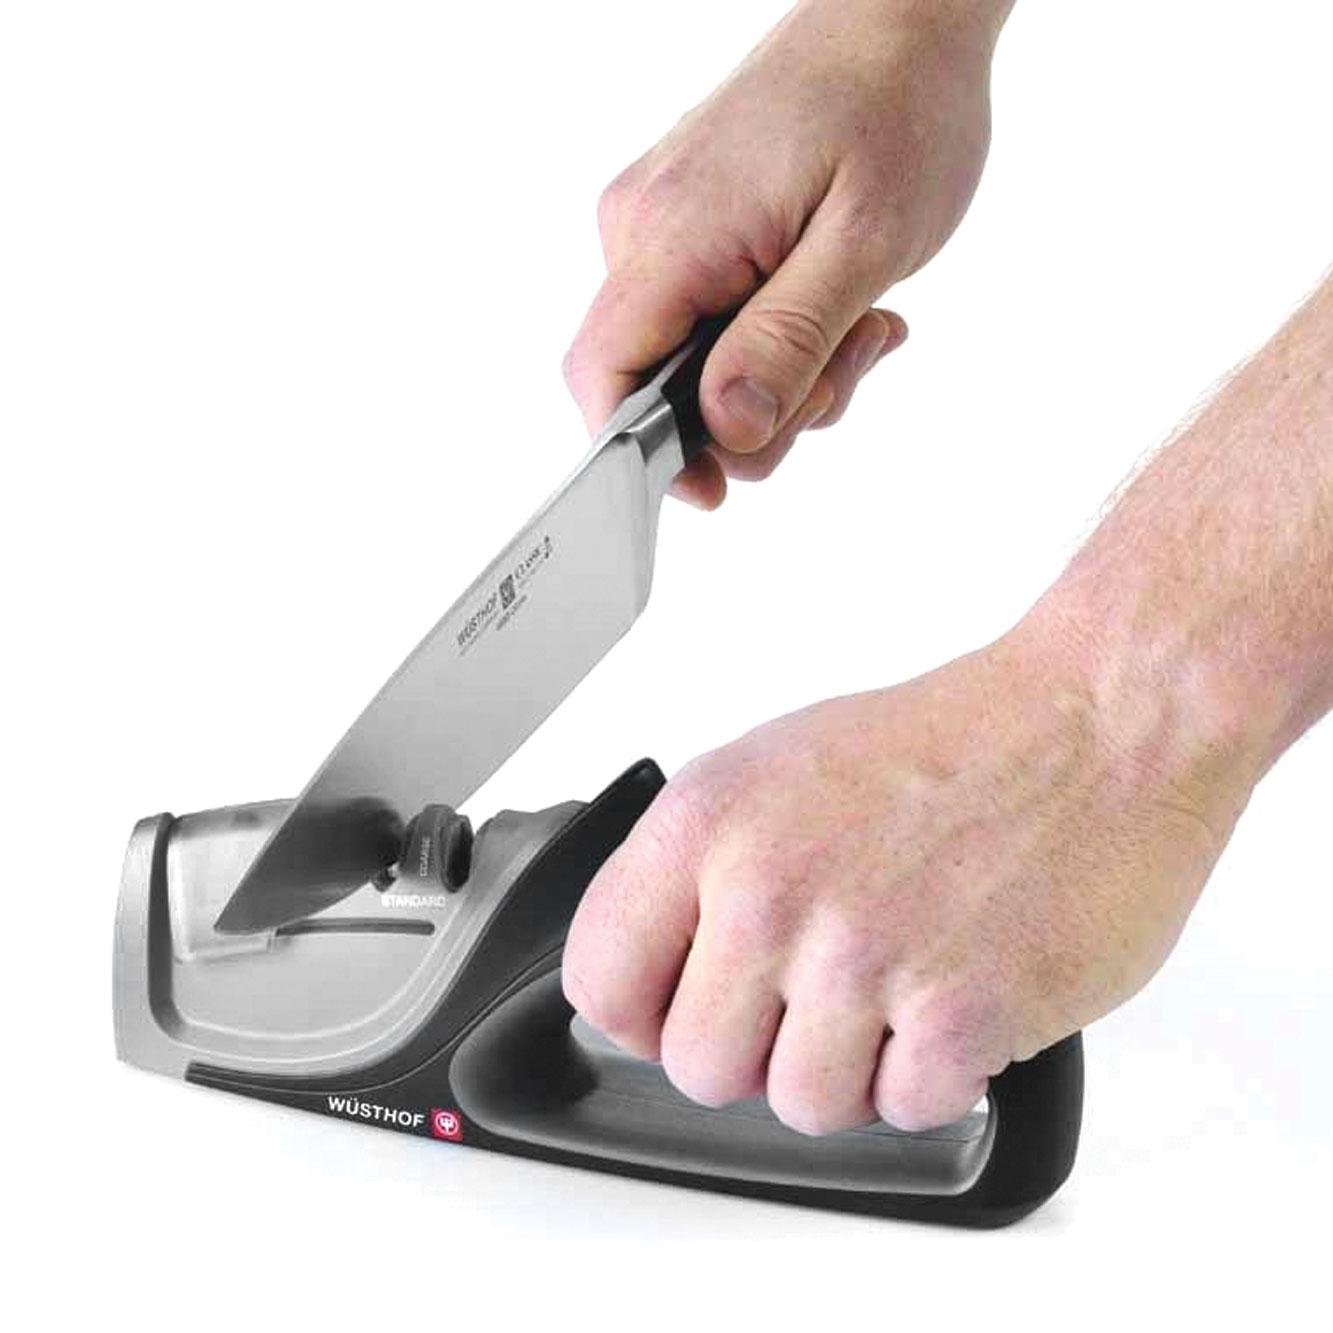 Wusthof 4 Stage Knife Sharpener For Asian Amp Western Knives